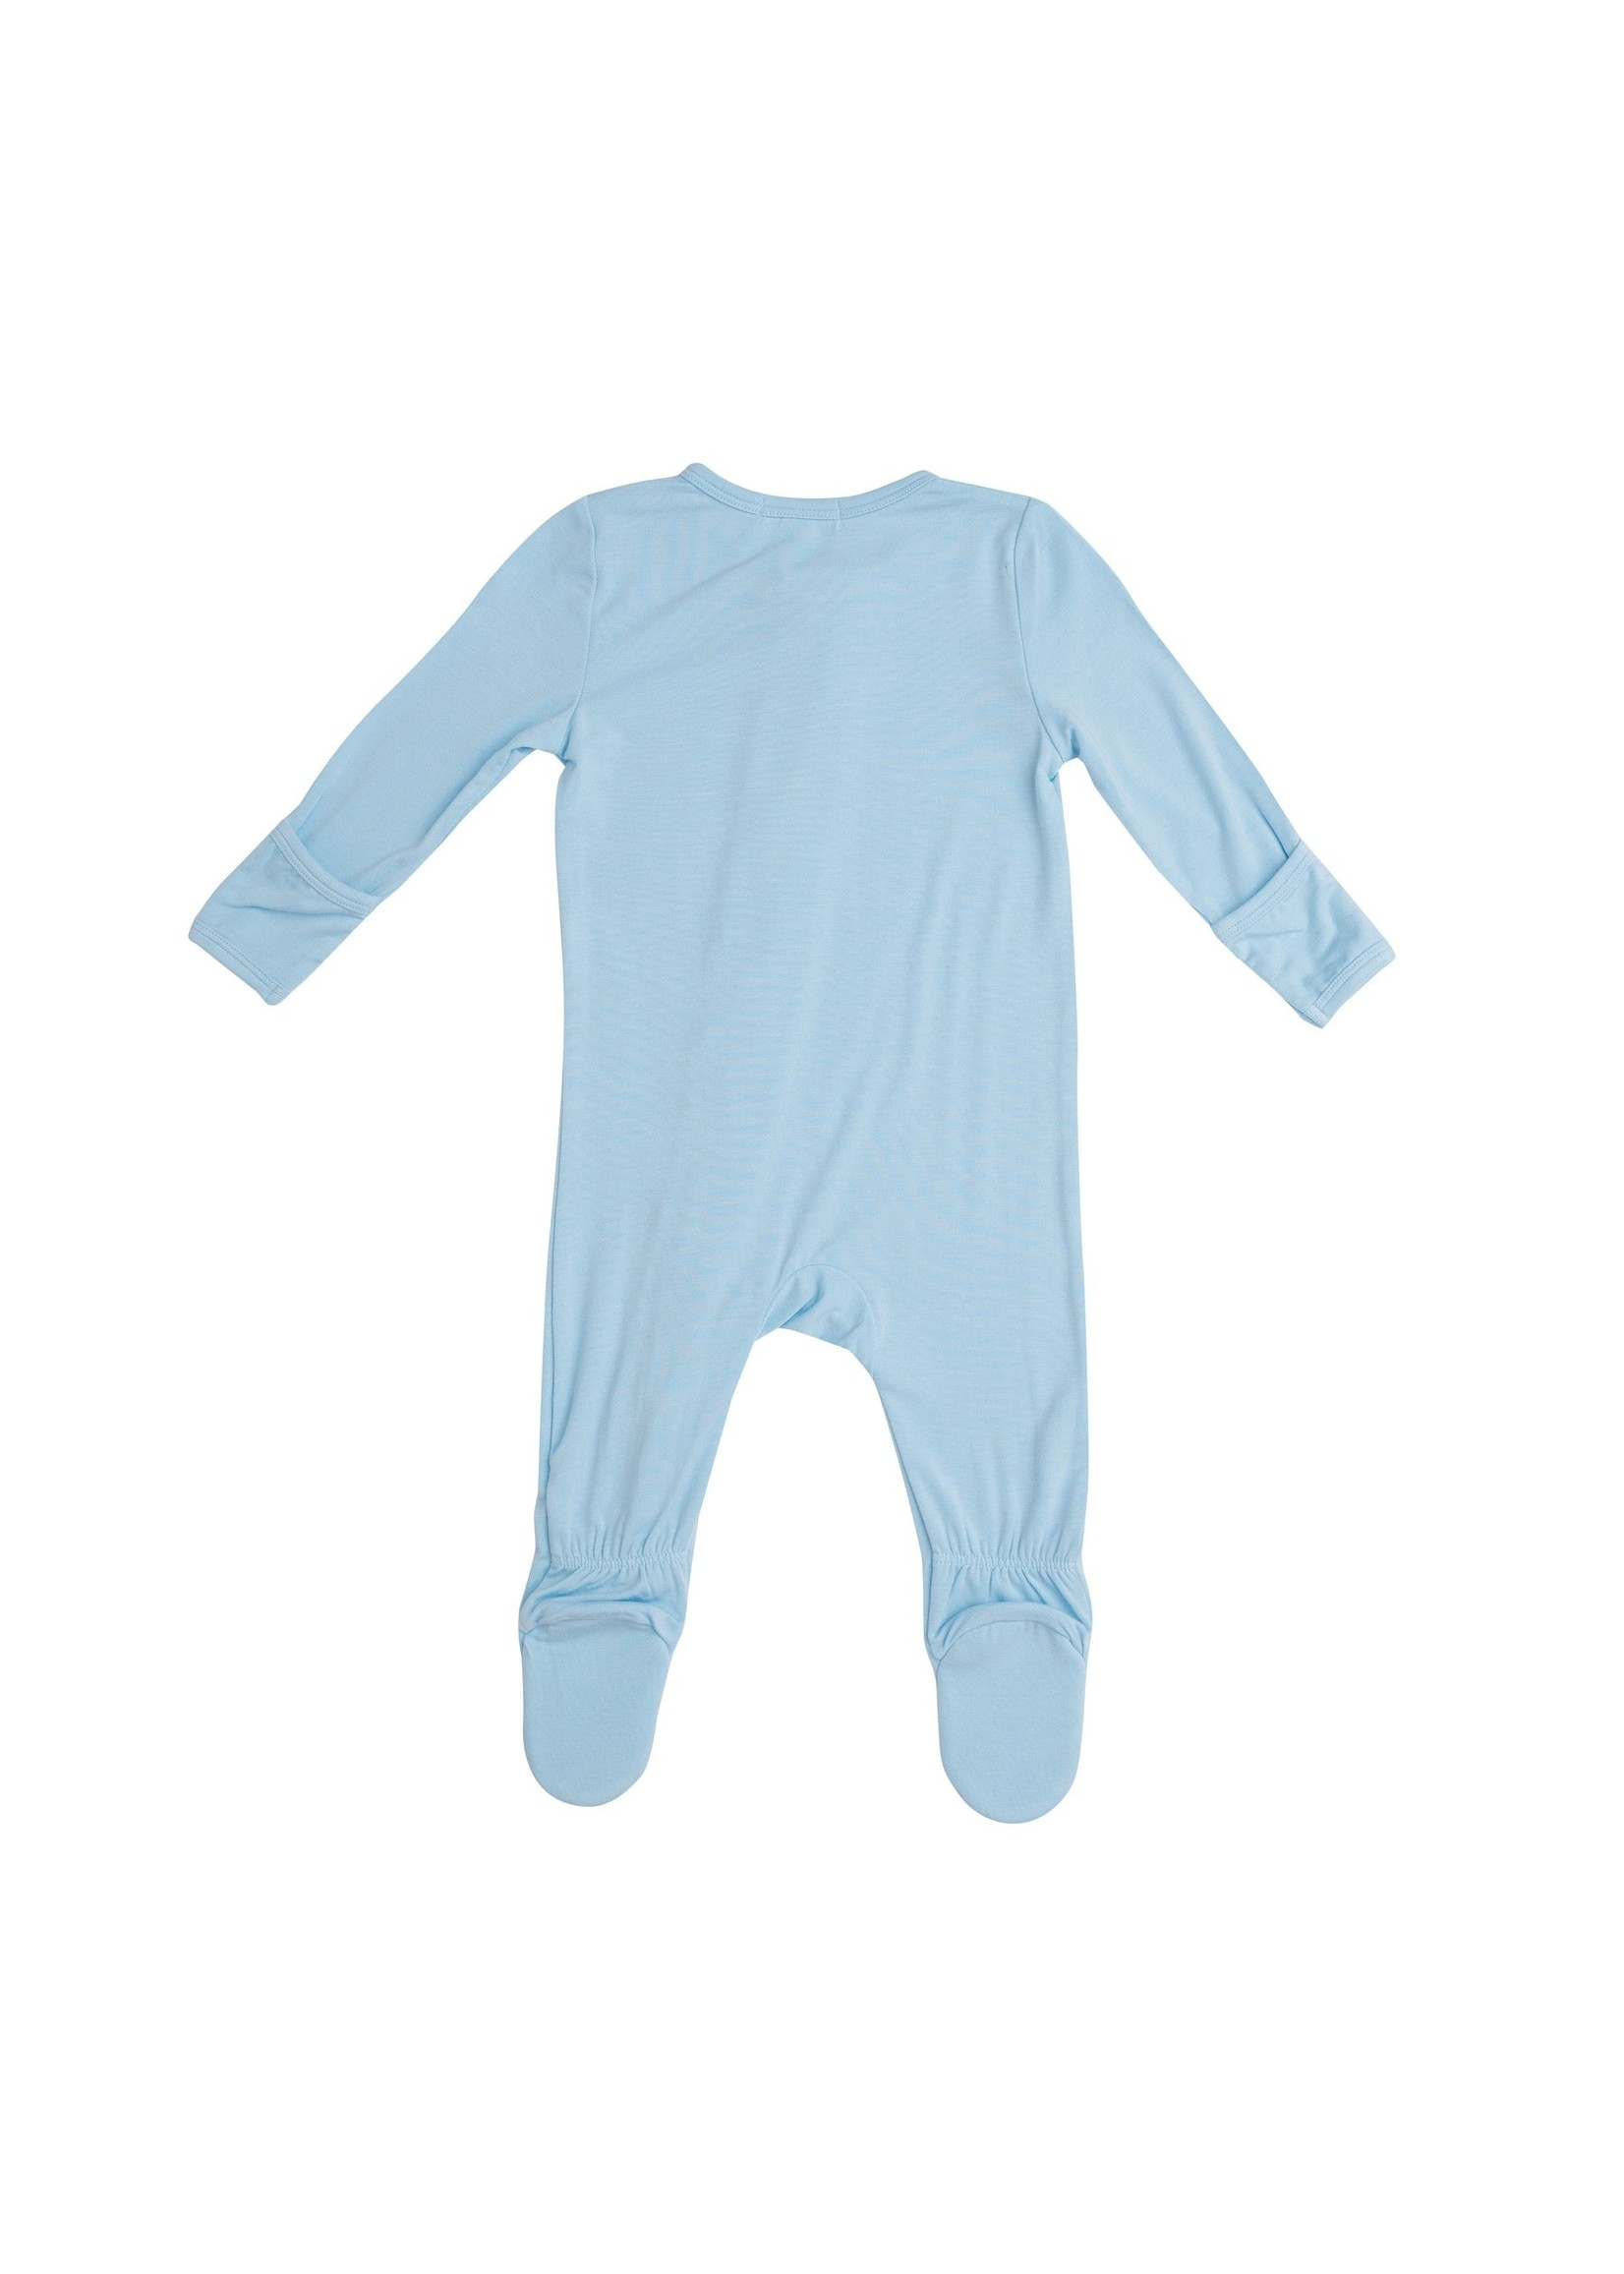 Angel Dear Modern Basics Zipper Footie Cordyalis Blue